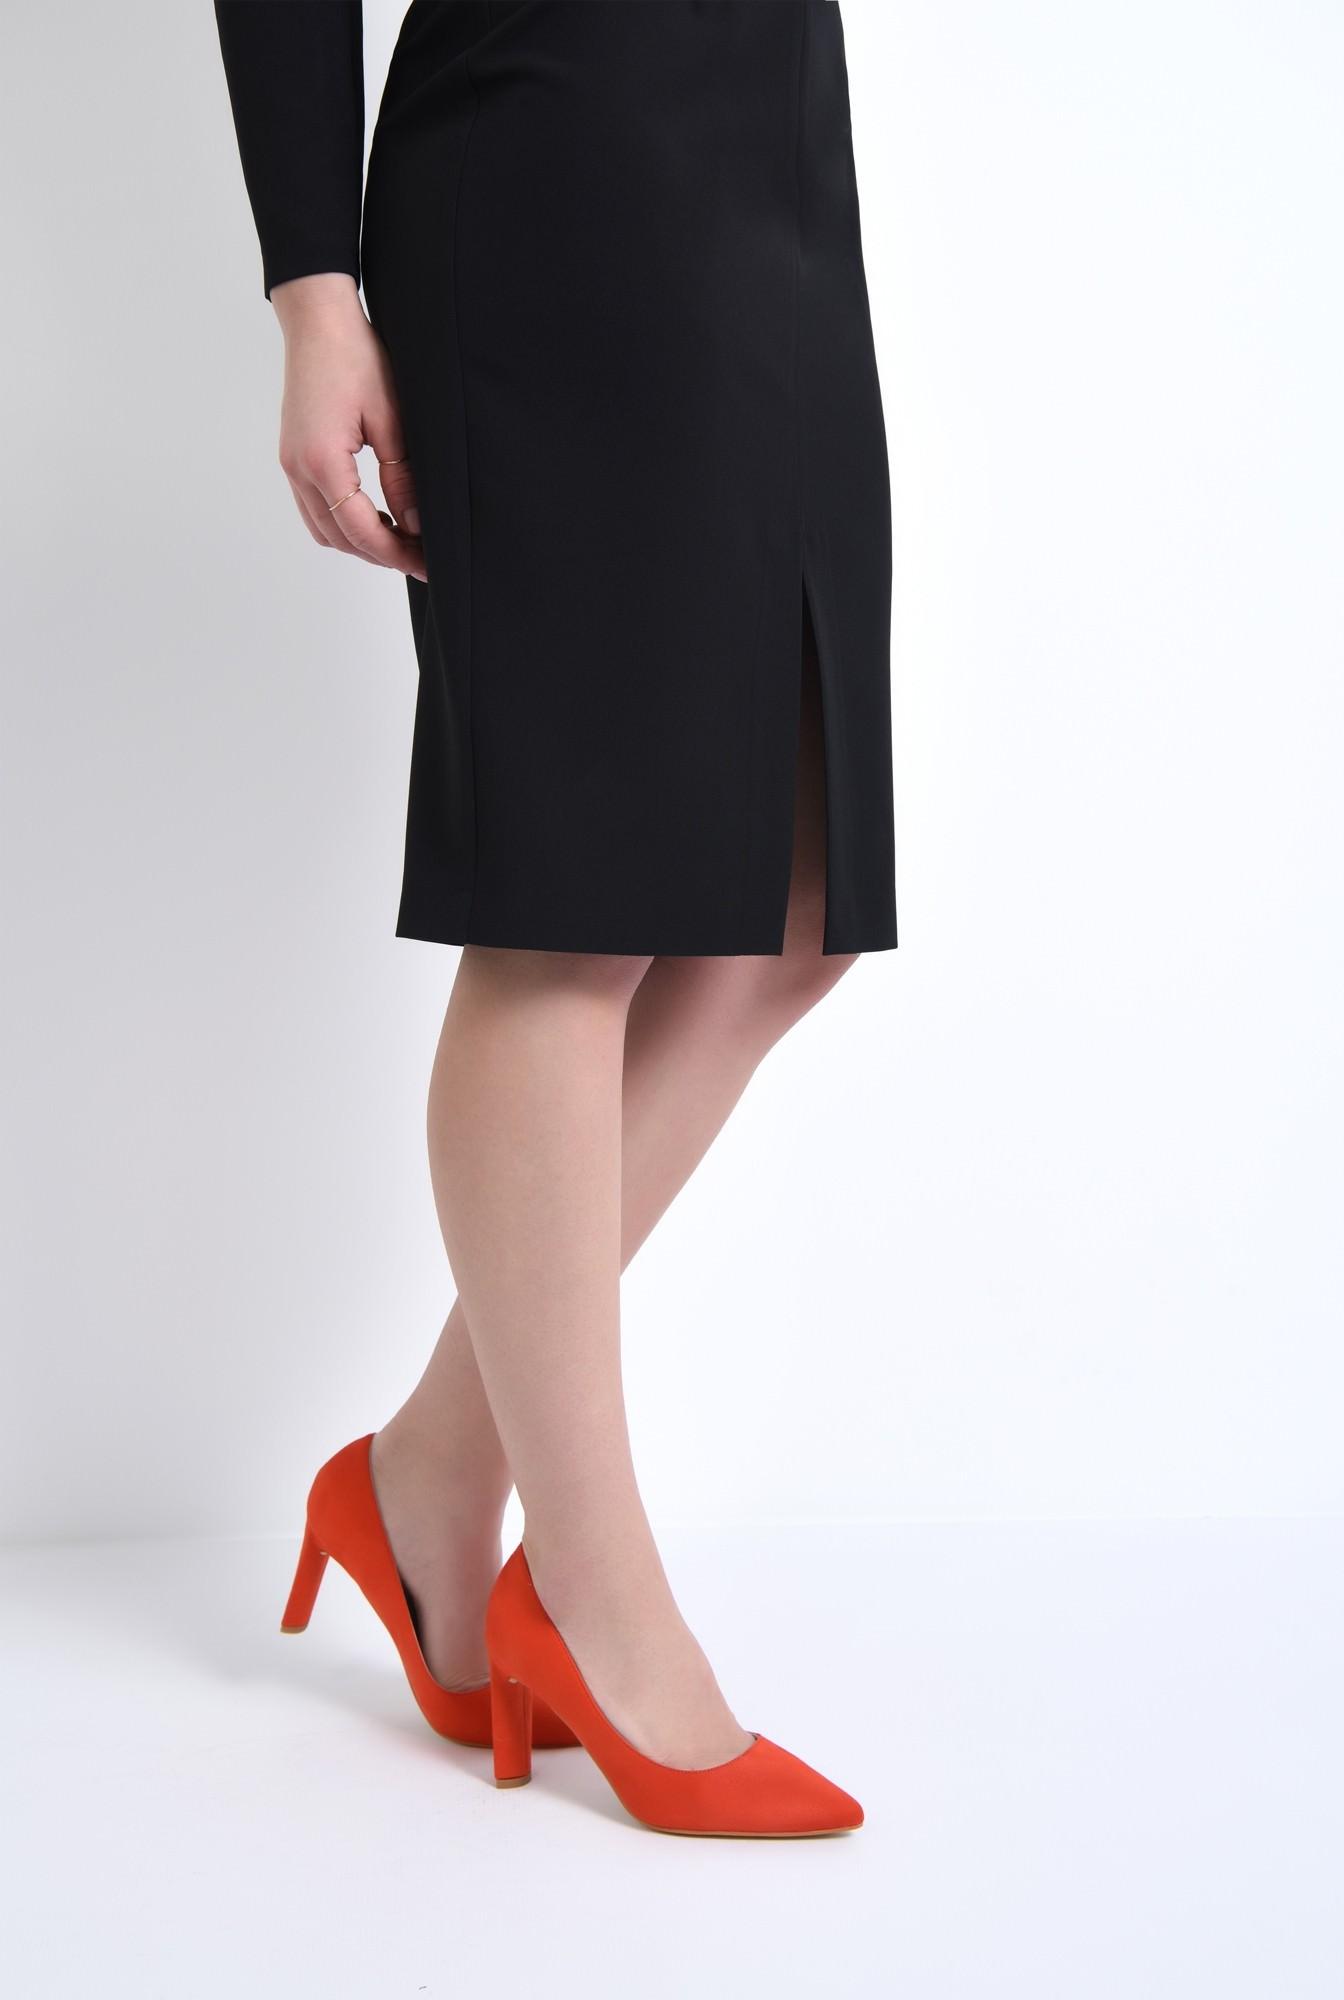 4 - pantofi casual, rosu, toc inalt